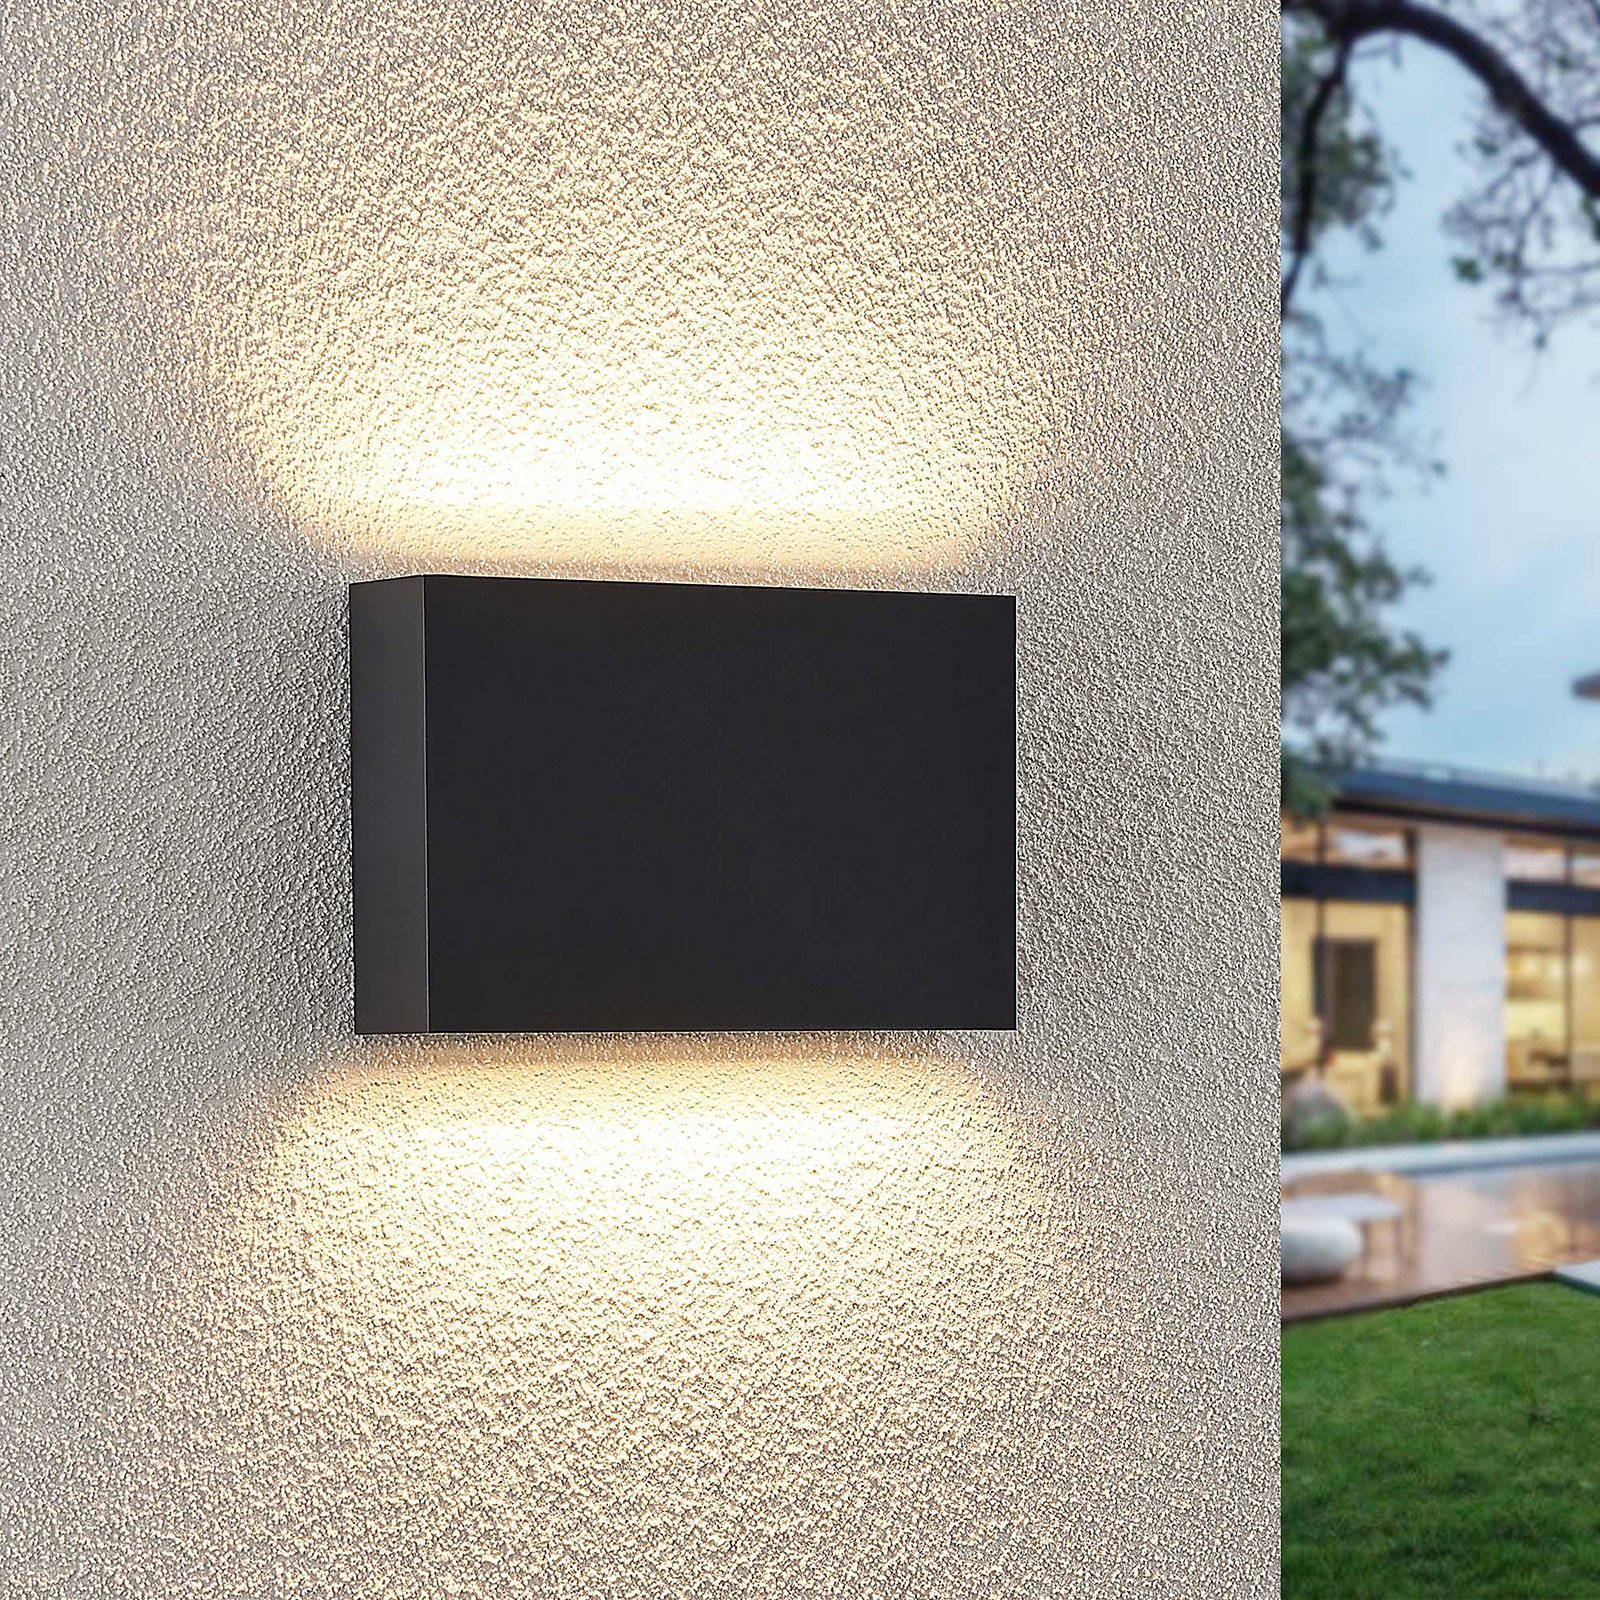 Lindby Jarte utendørs LED-vegglampe, 20 cm up/down